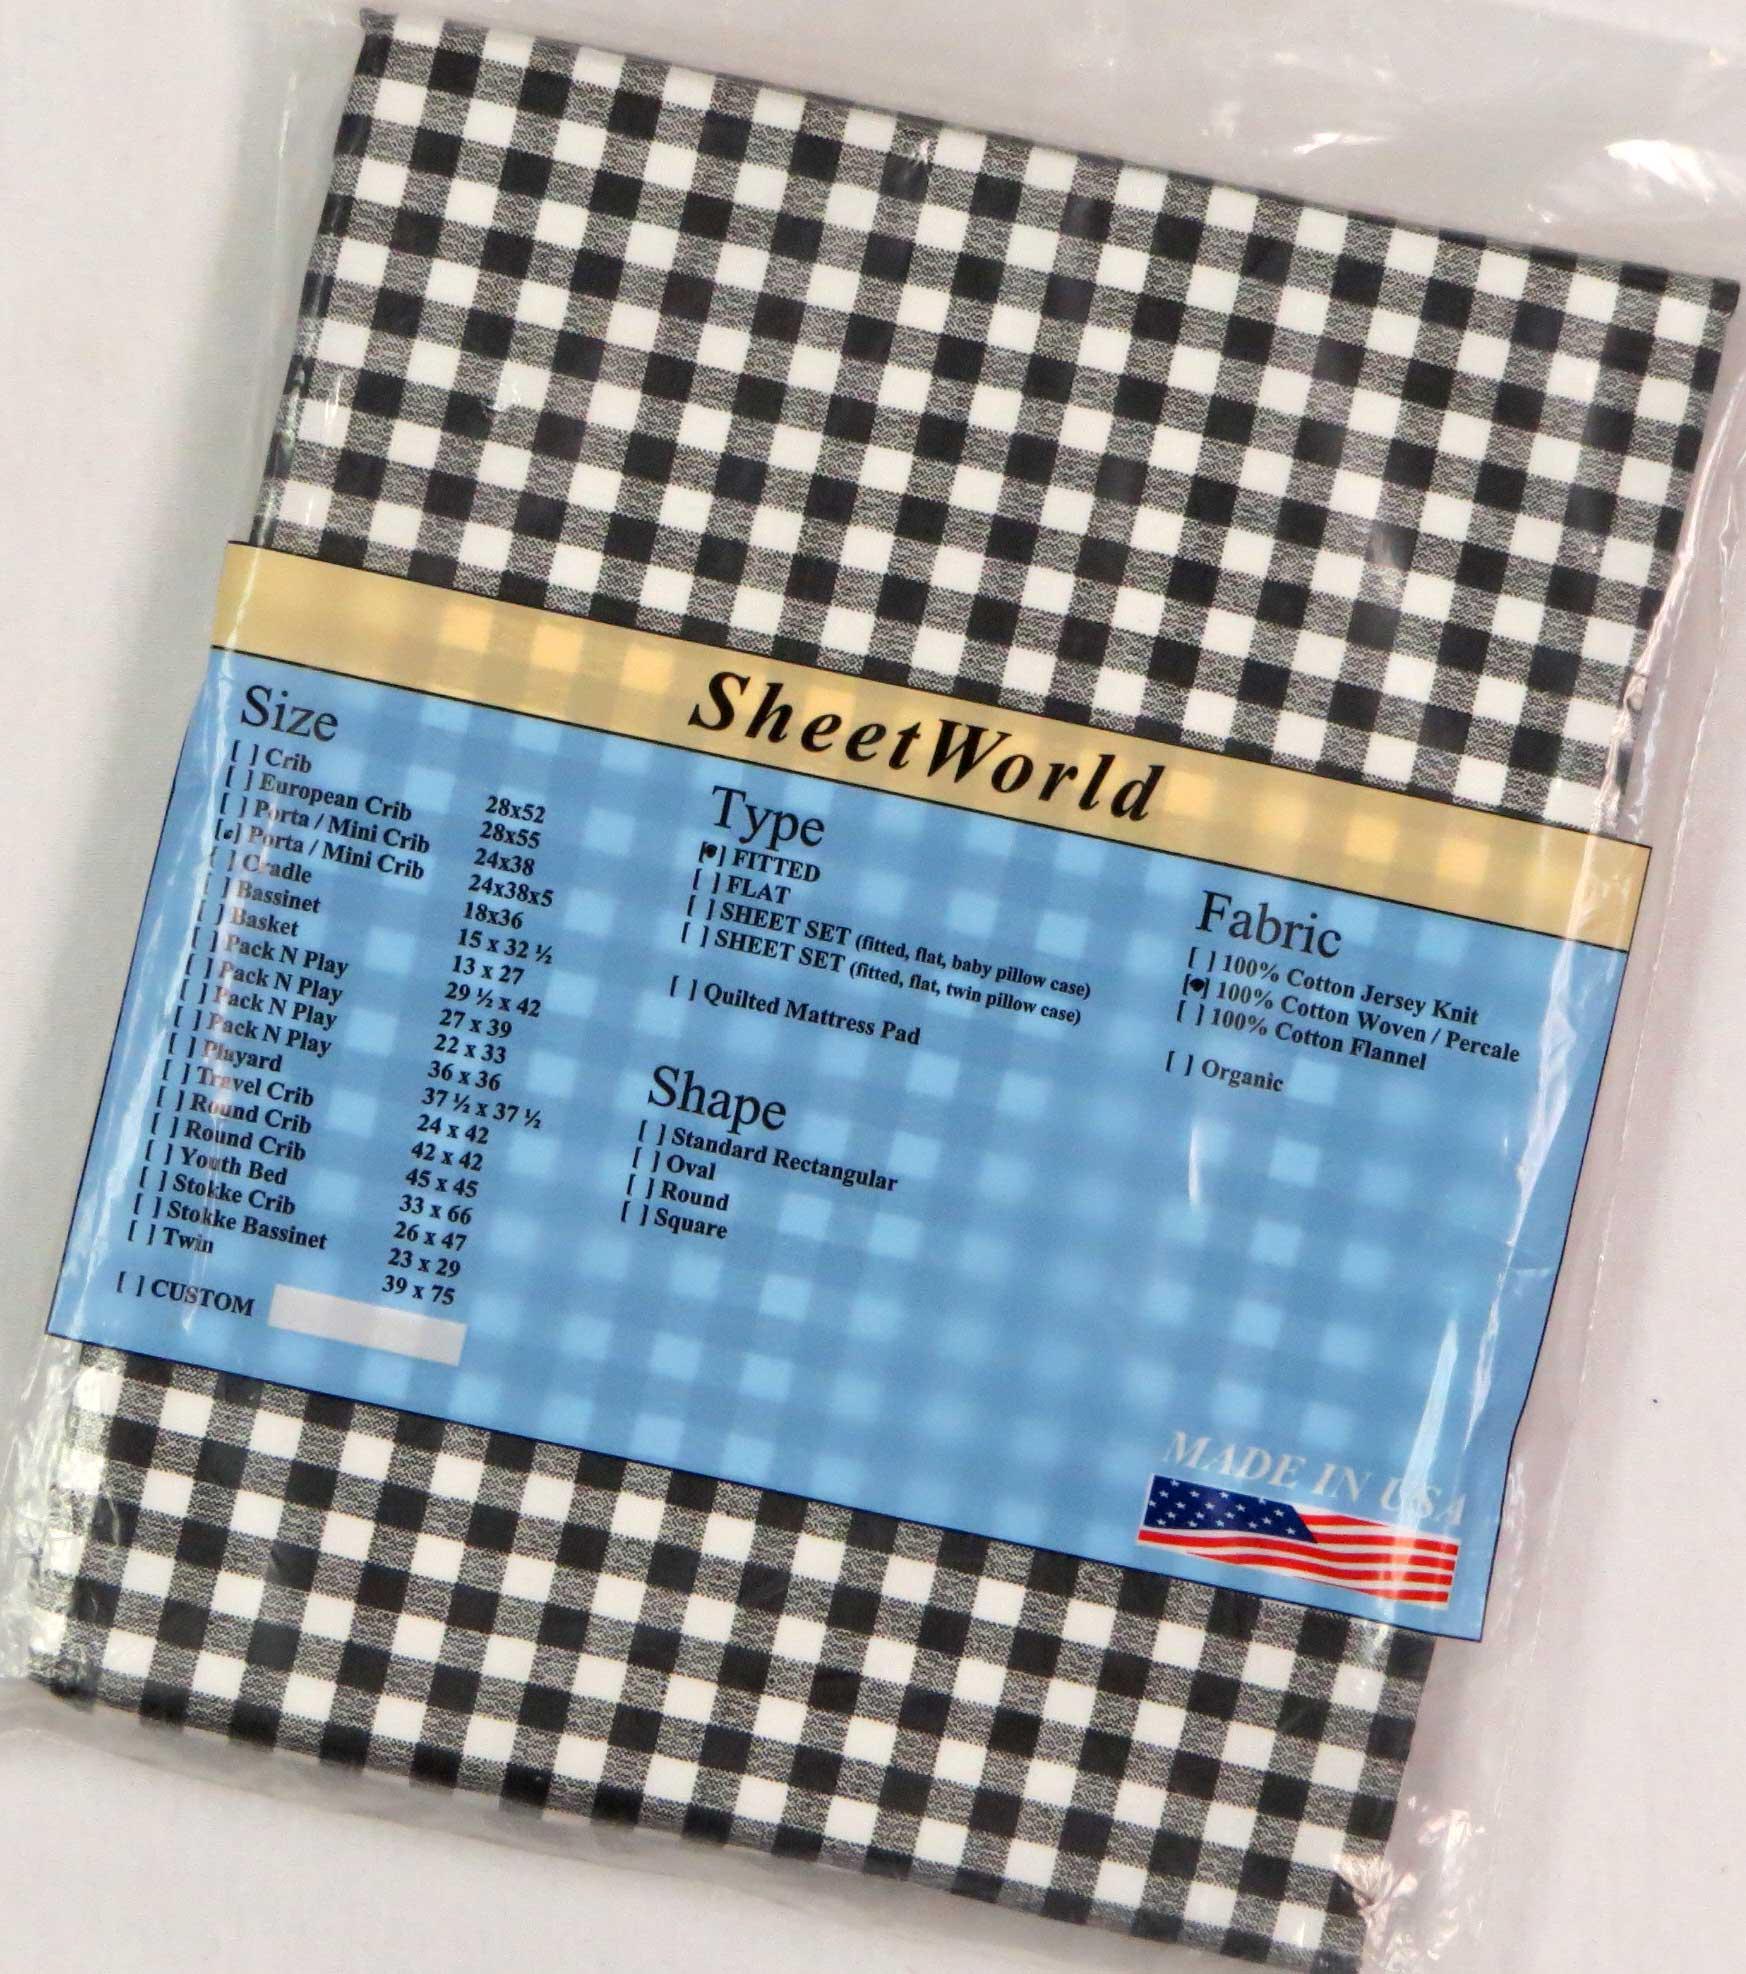 Black Gingham Check Cotton Portable / Mini Crib Sheet - 24 x 38 x 5